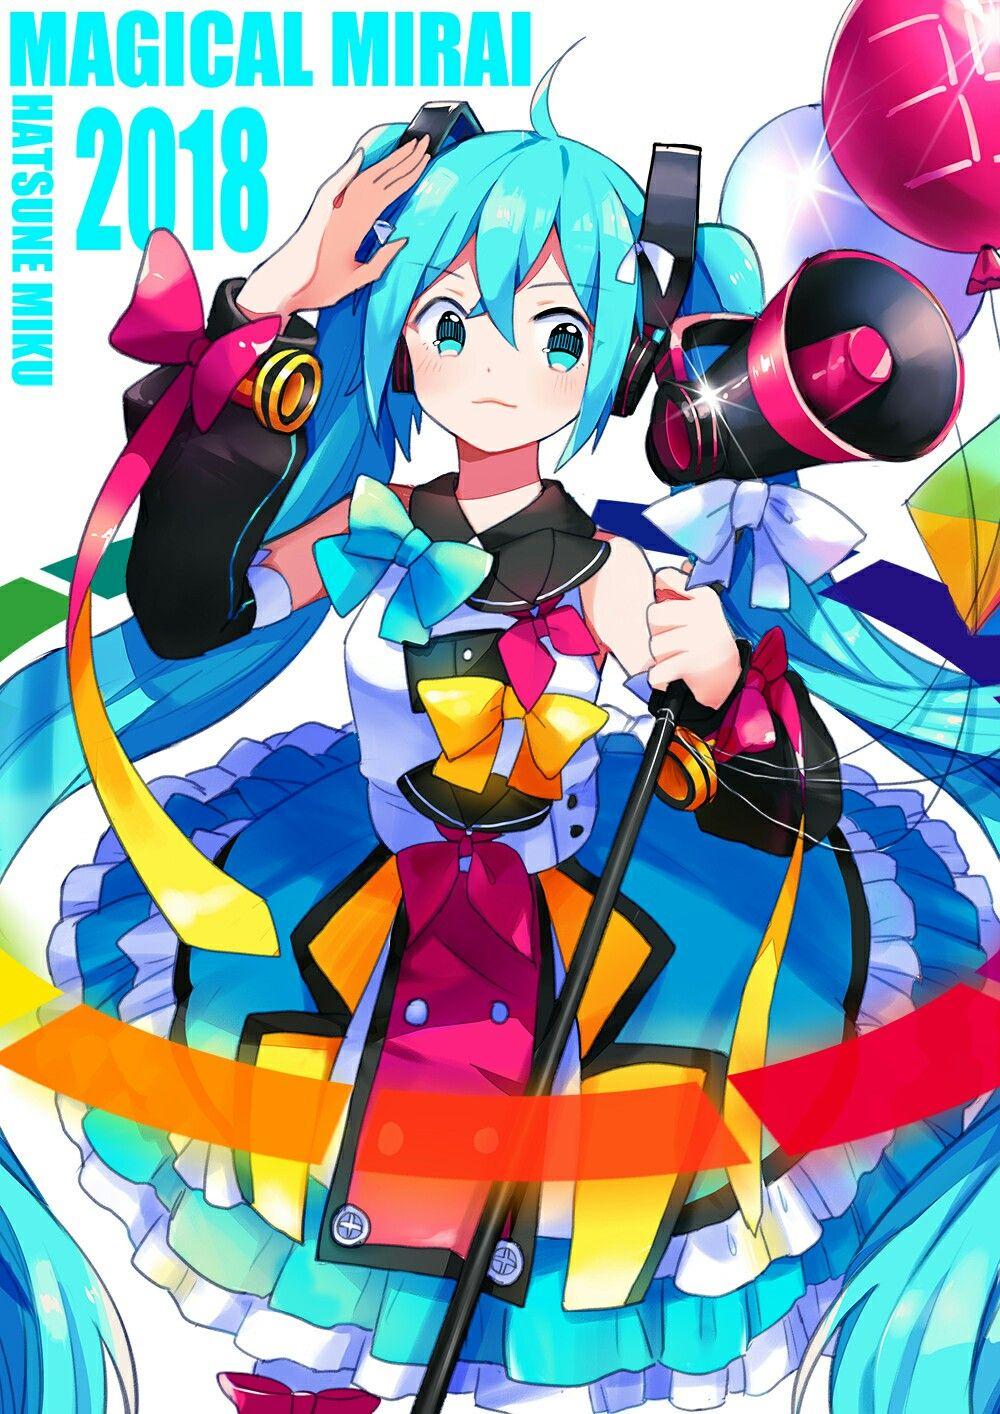 「Vocaloid & Voiceroid」おしゃれまとめの人気アイデア|Pinterest|Alnime